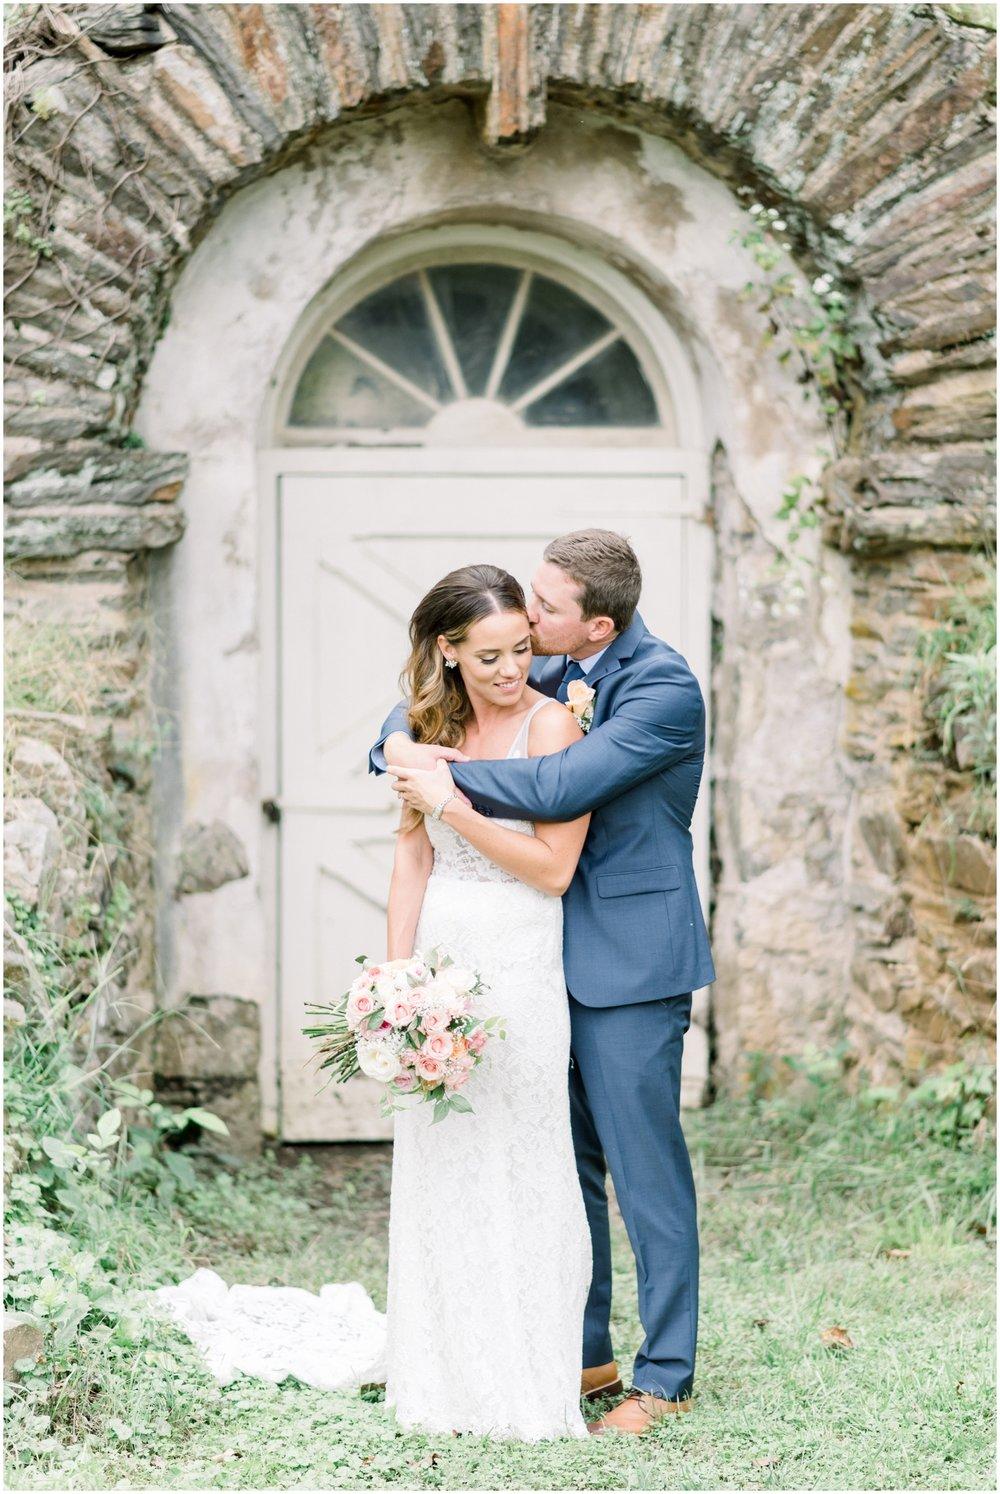 Summer Wedding at Philander Chase Knox Estate in Malvern, PA - Krista Brackin Photography_0068.jpg